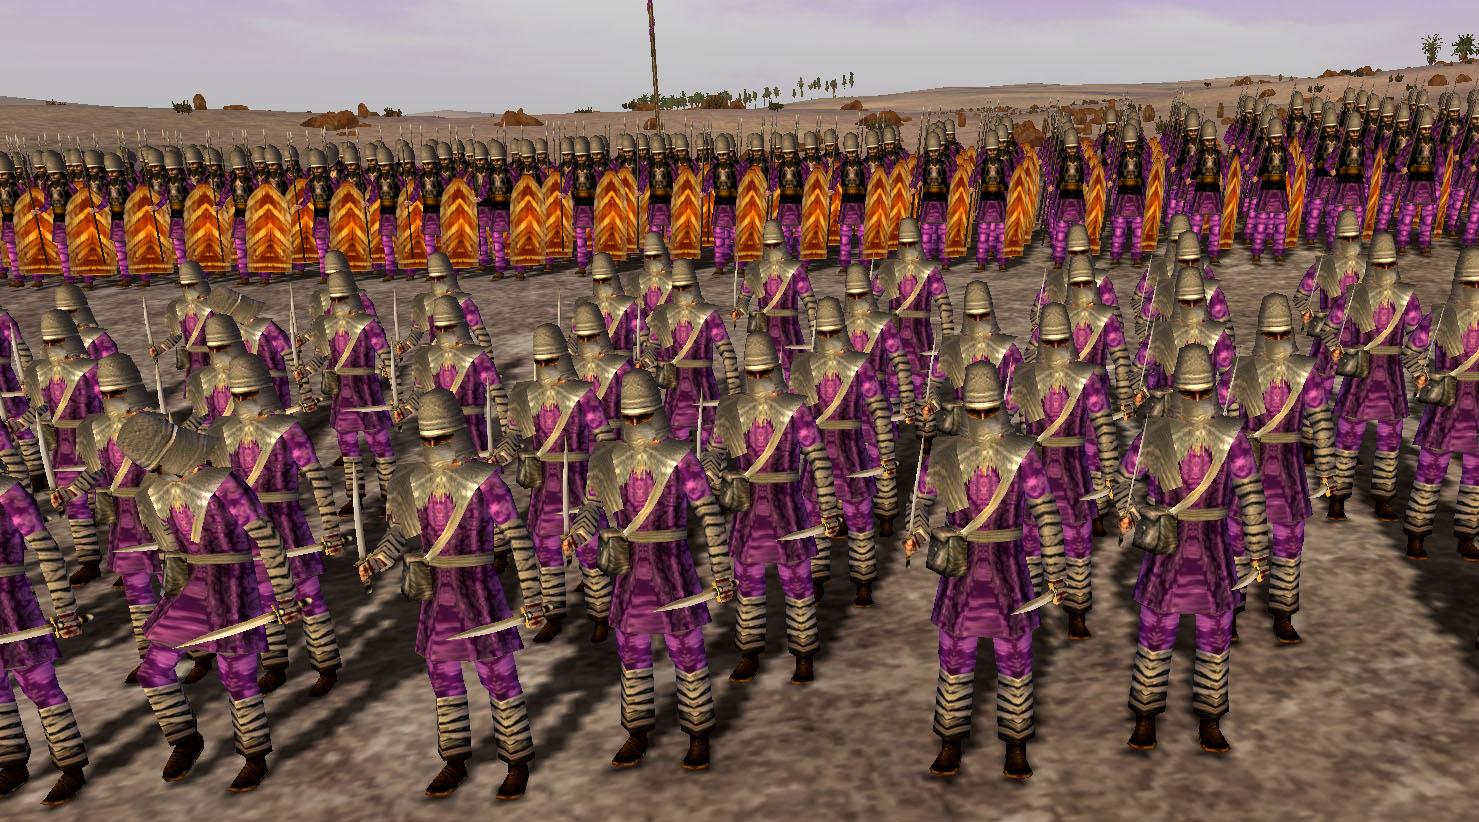 Sassanid Nassalars and Satrapy Militia